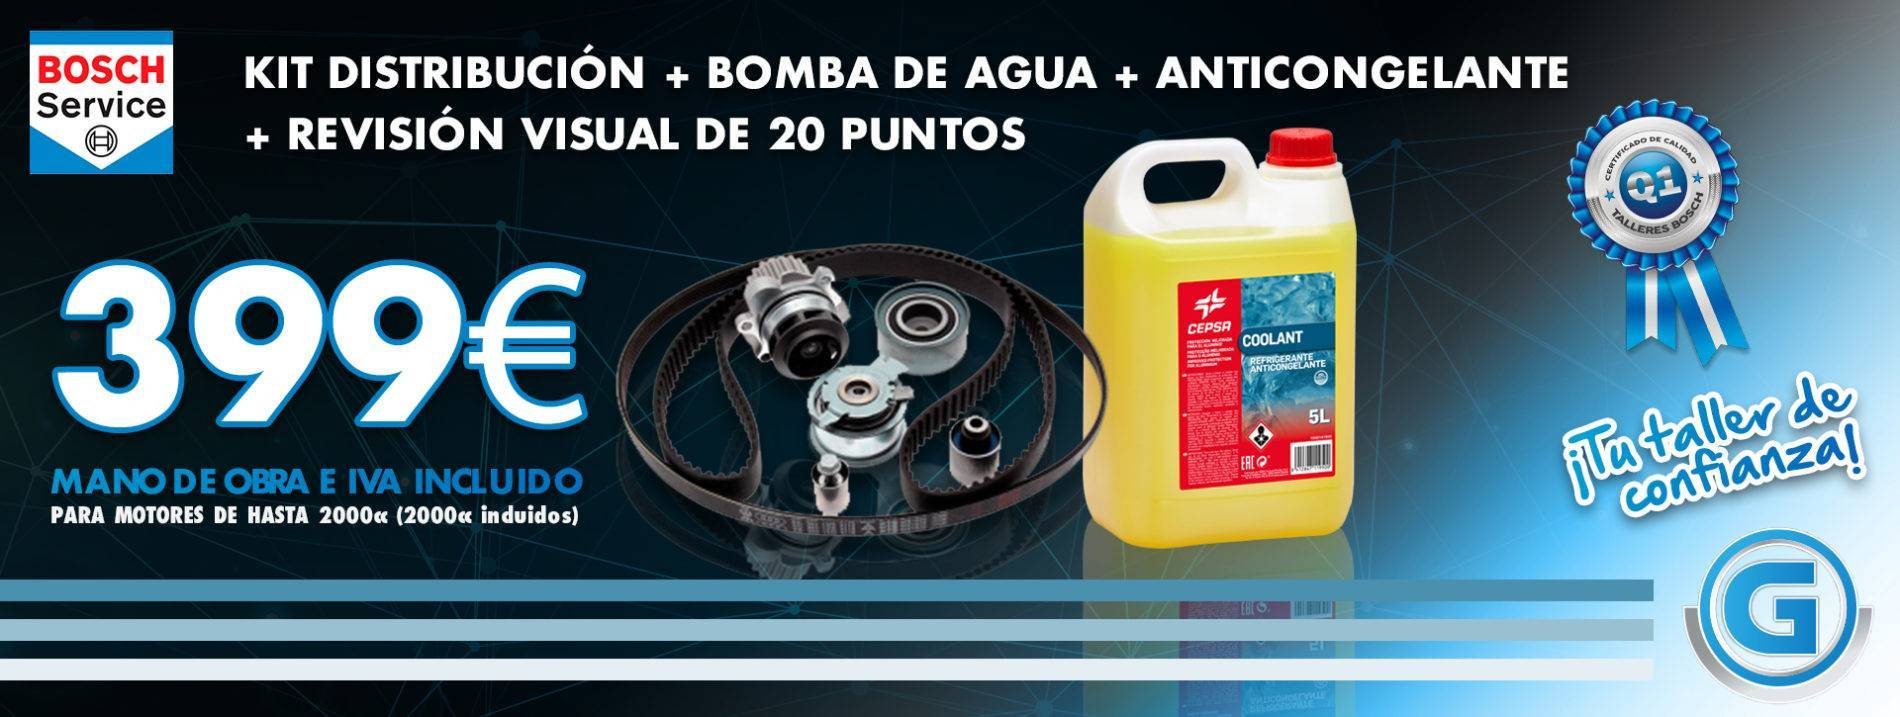 bomba agua + kit correa distribucion precio